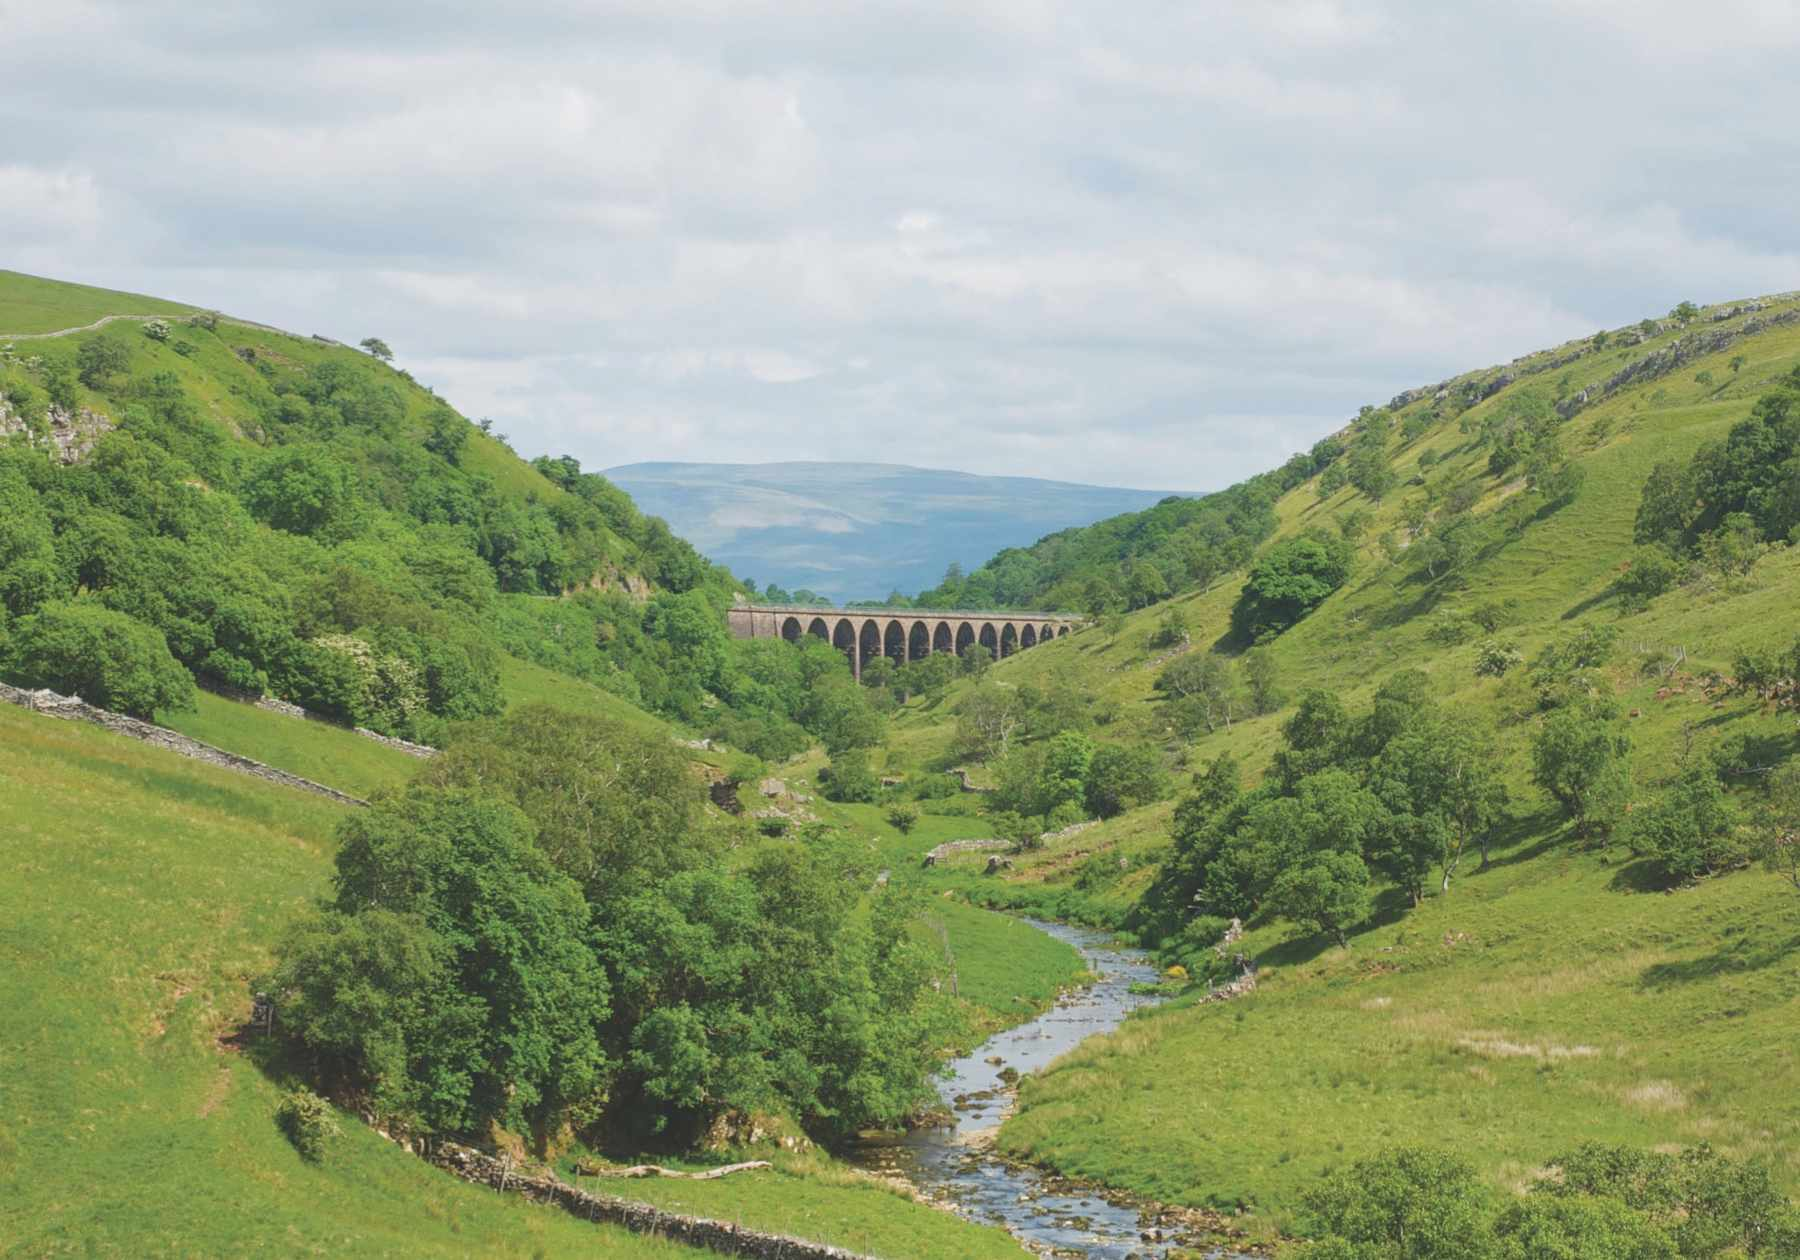 D9X2RE Railway viaduct across Smardale Gill, a Cumbria Wildlife Trust nature reserve, near Kirkby Stephen, Cumbria, England UK